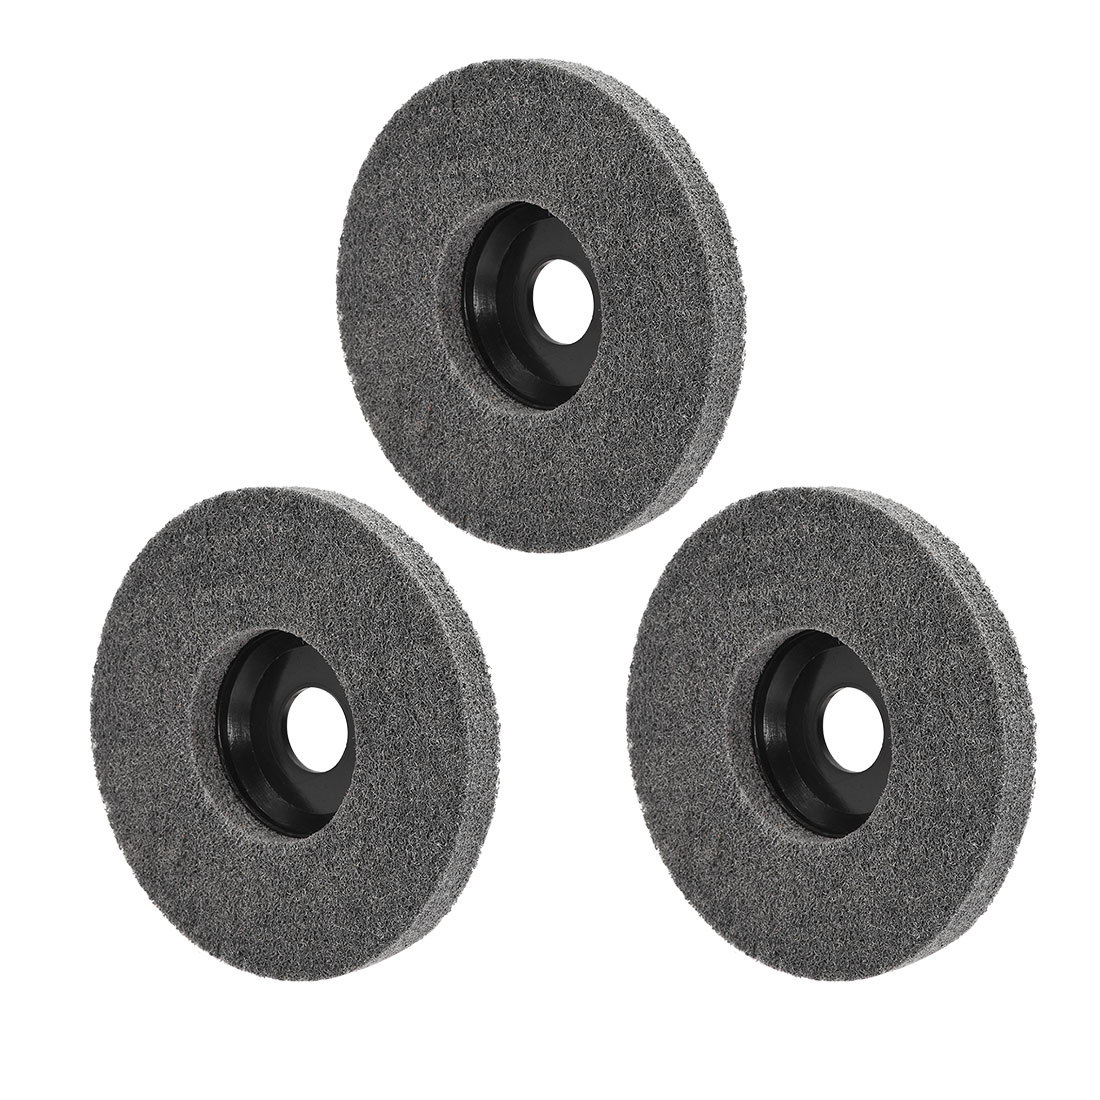 5 Inch Polishing Wheel Buffing Pad Felt Disc for 100 Angle Grinders Black 3pcs